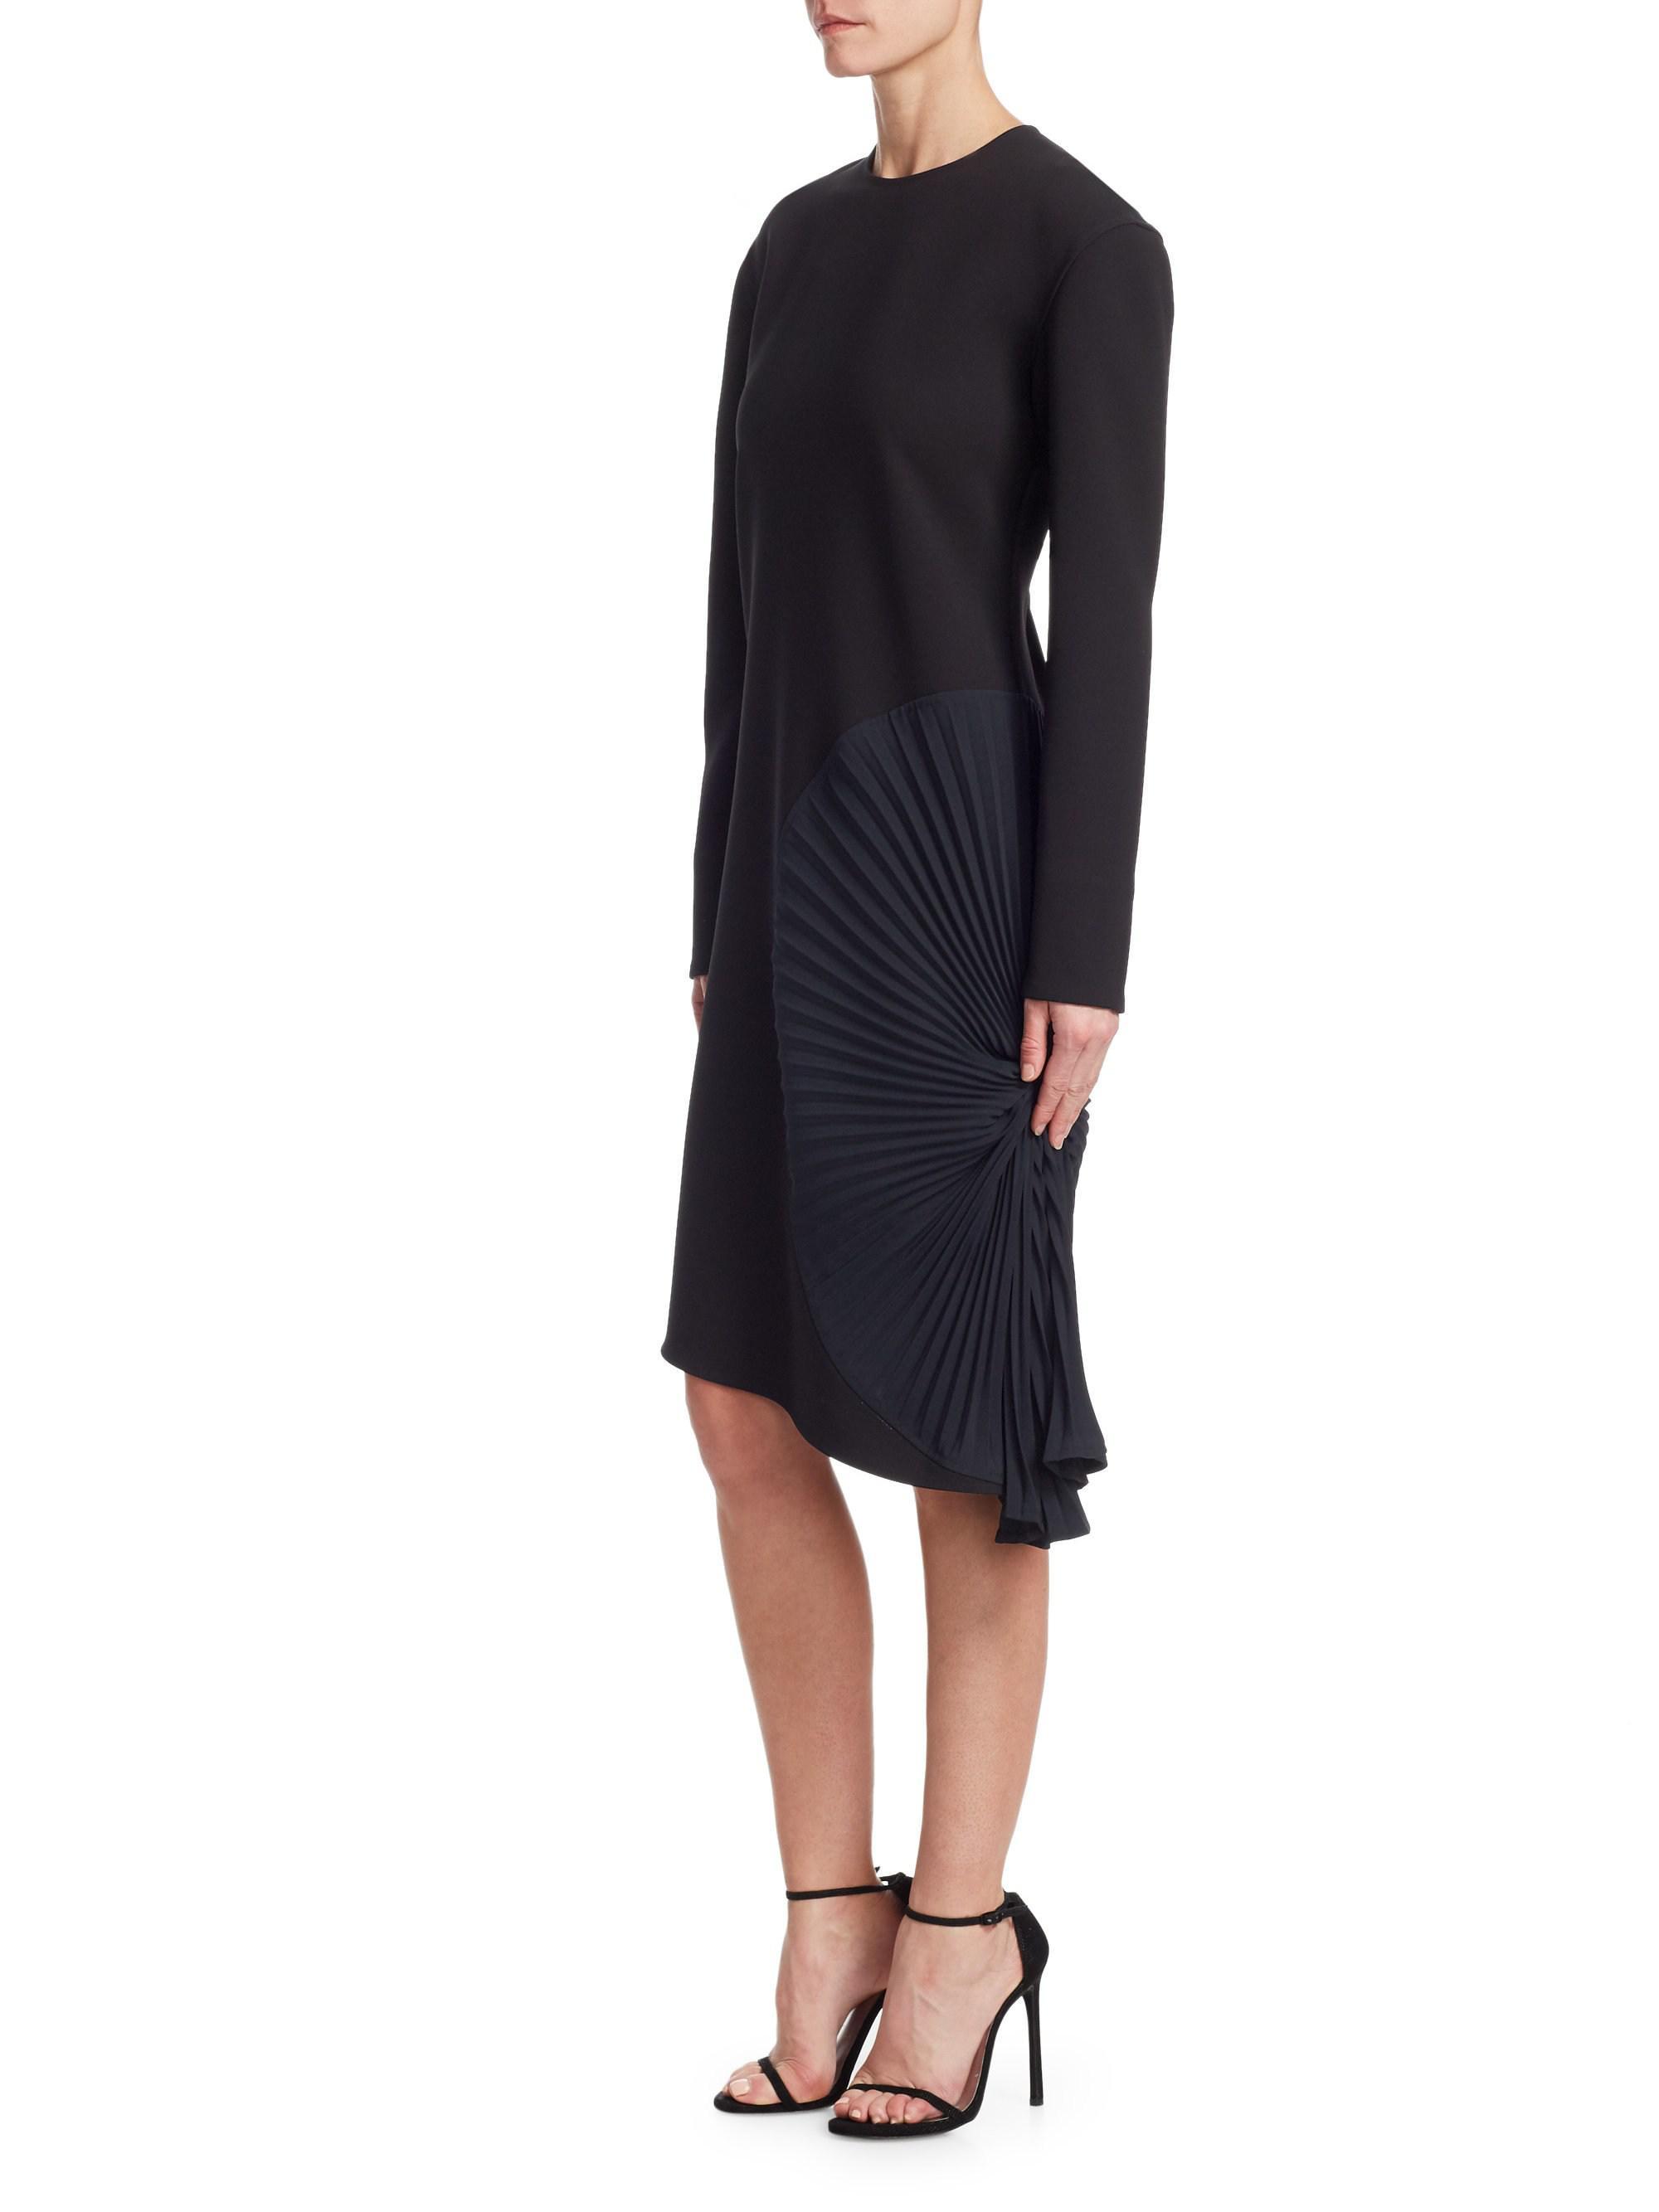 ab5a06159062 victoria-beckham-black-Long-Sleeve-Pleated-Panel-Dress.jpeg